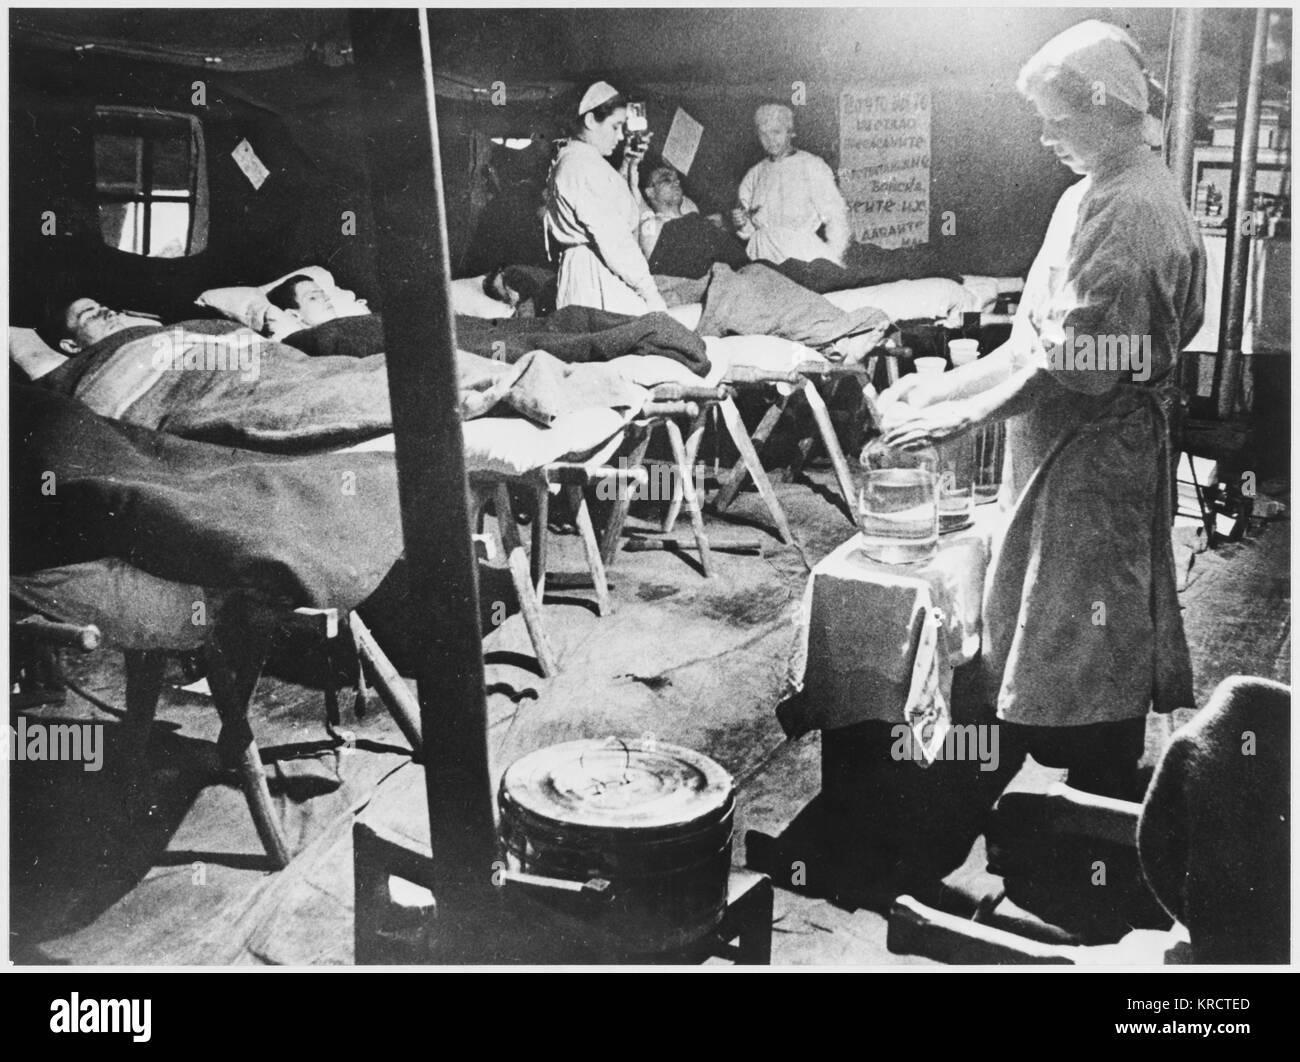 MEDICAL SCENES A Soviet Military Field Hospital. Date: WORLD WAR II - Stock Image